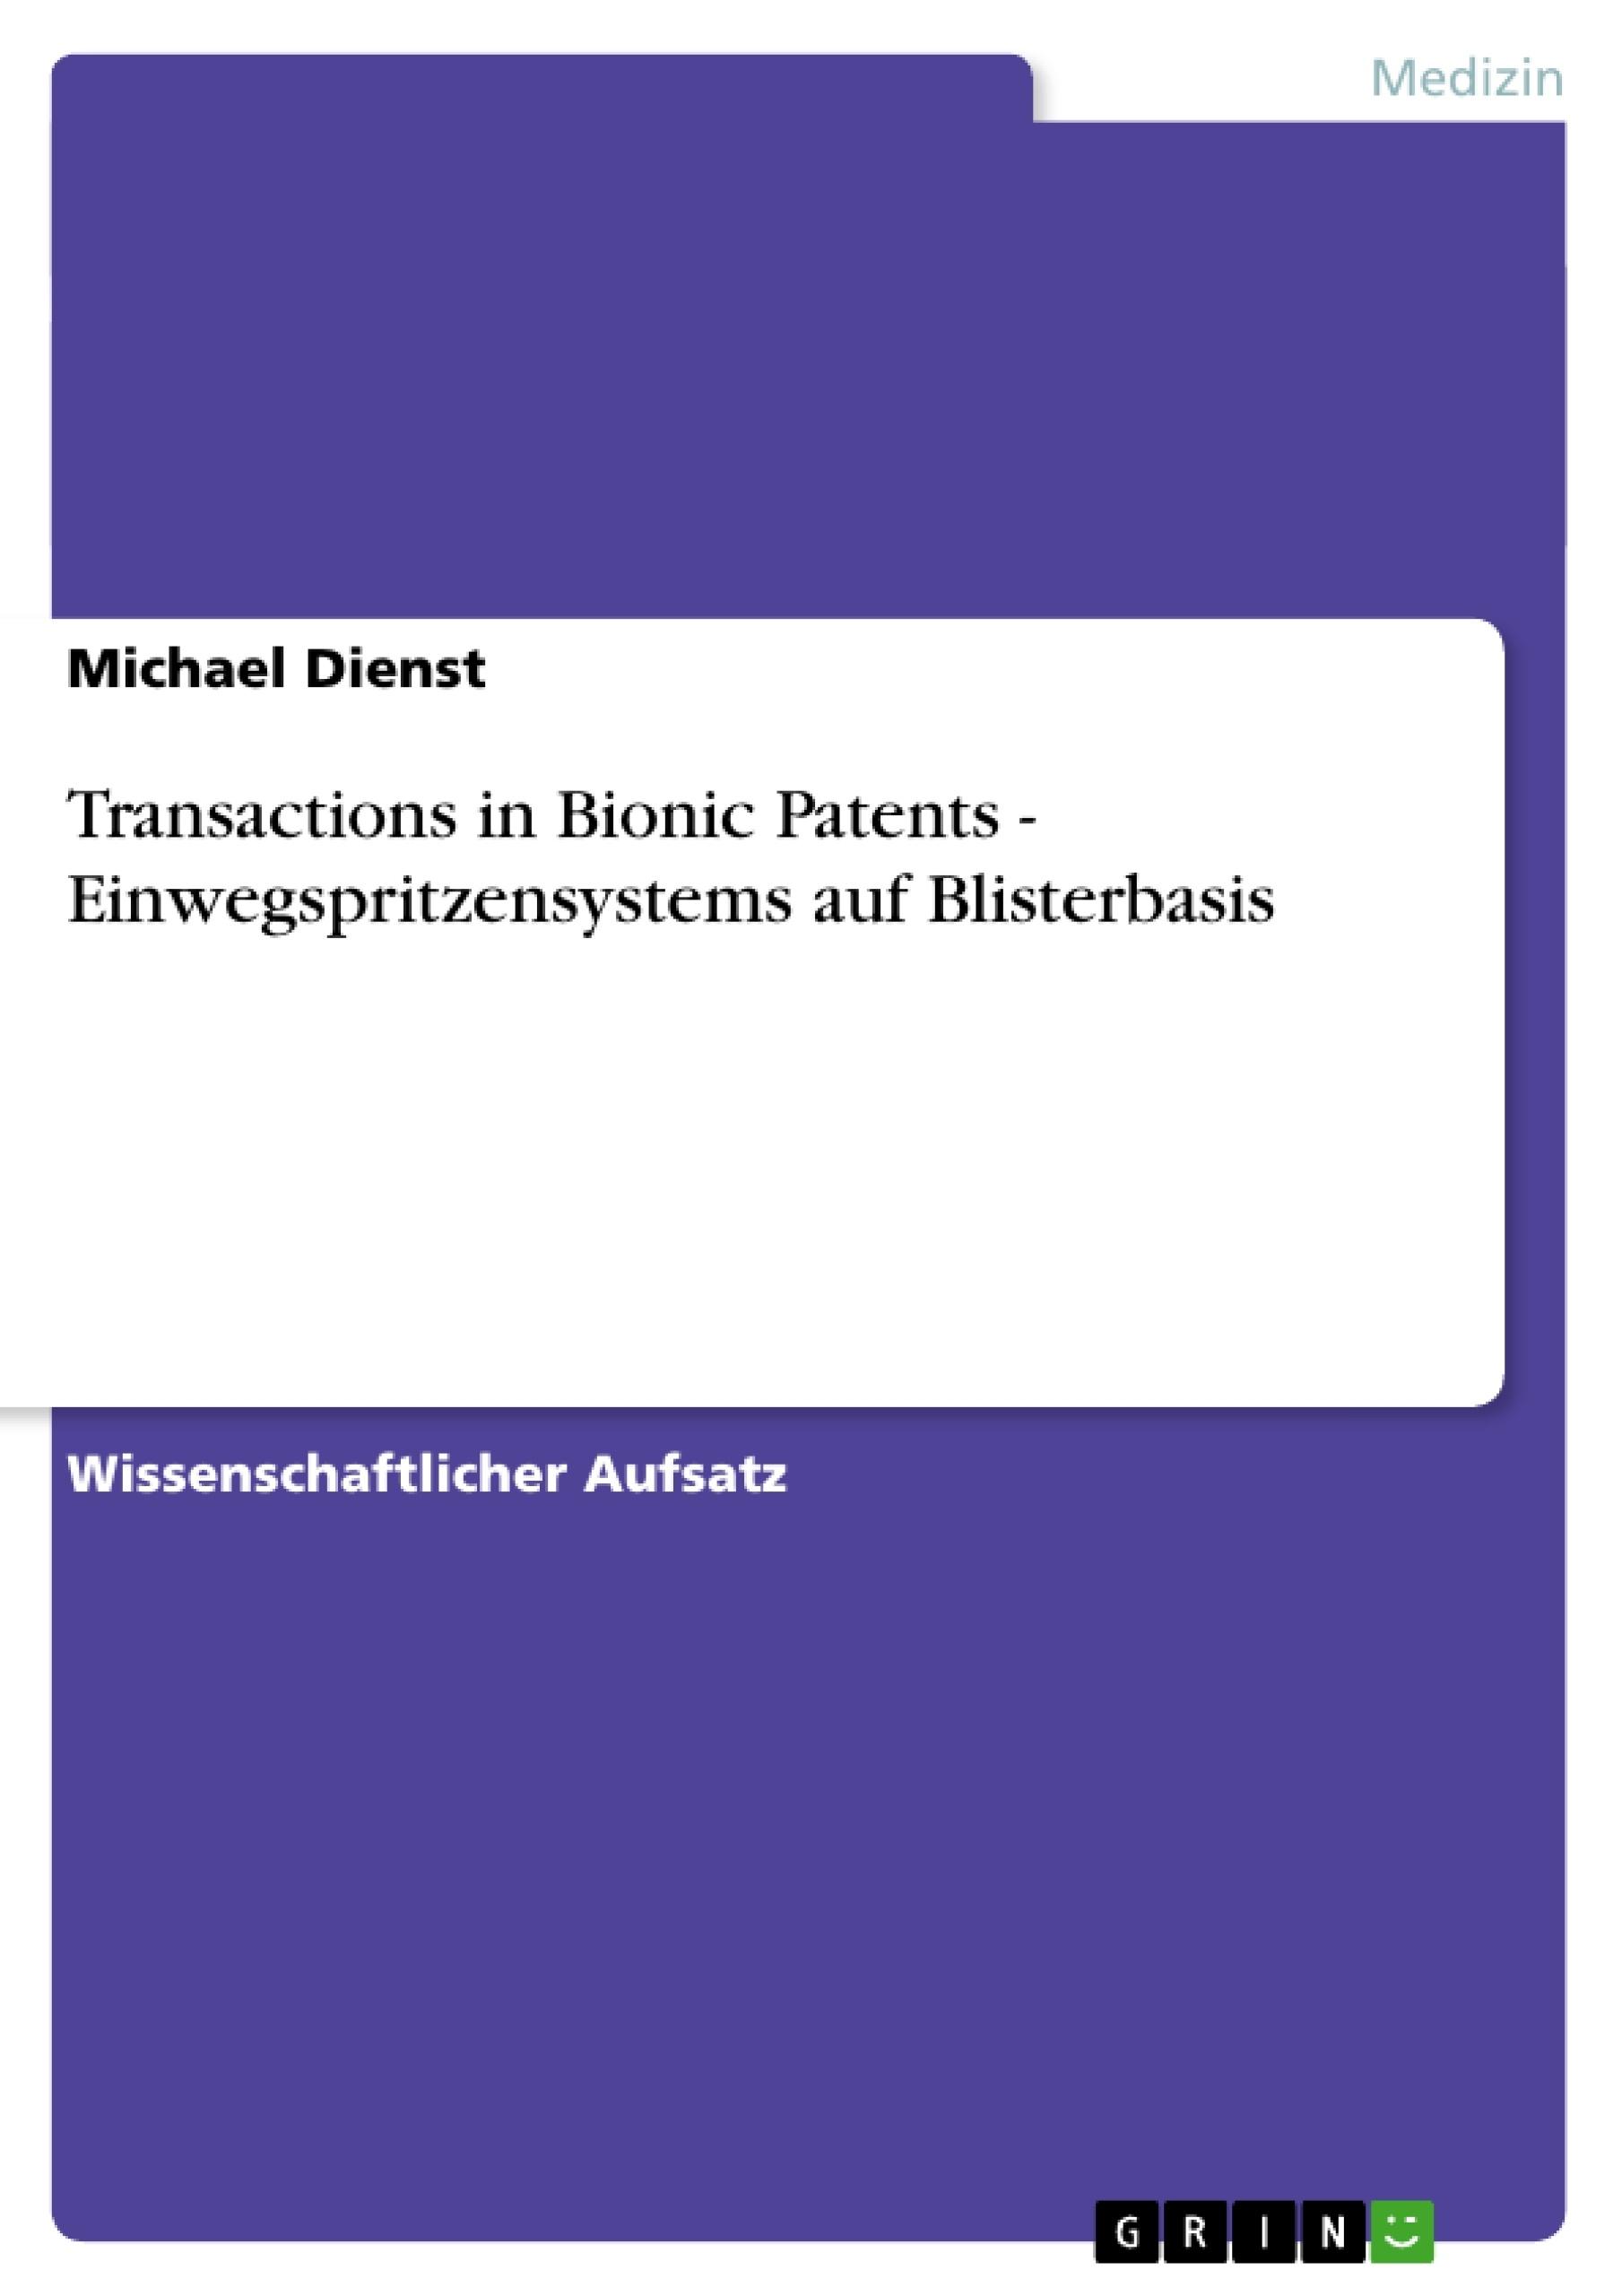 Titel: Transactions in Bionic Patents - Einwegspritzensystems auf Blisterbasis